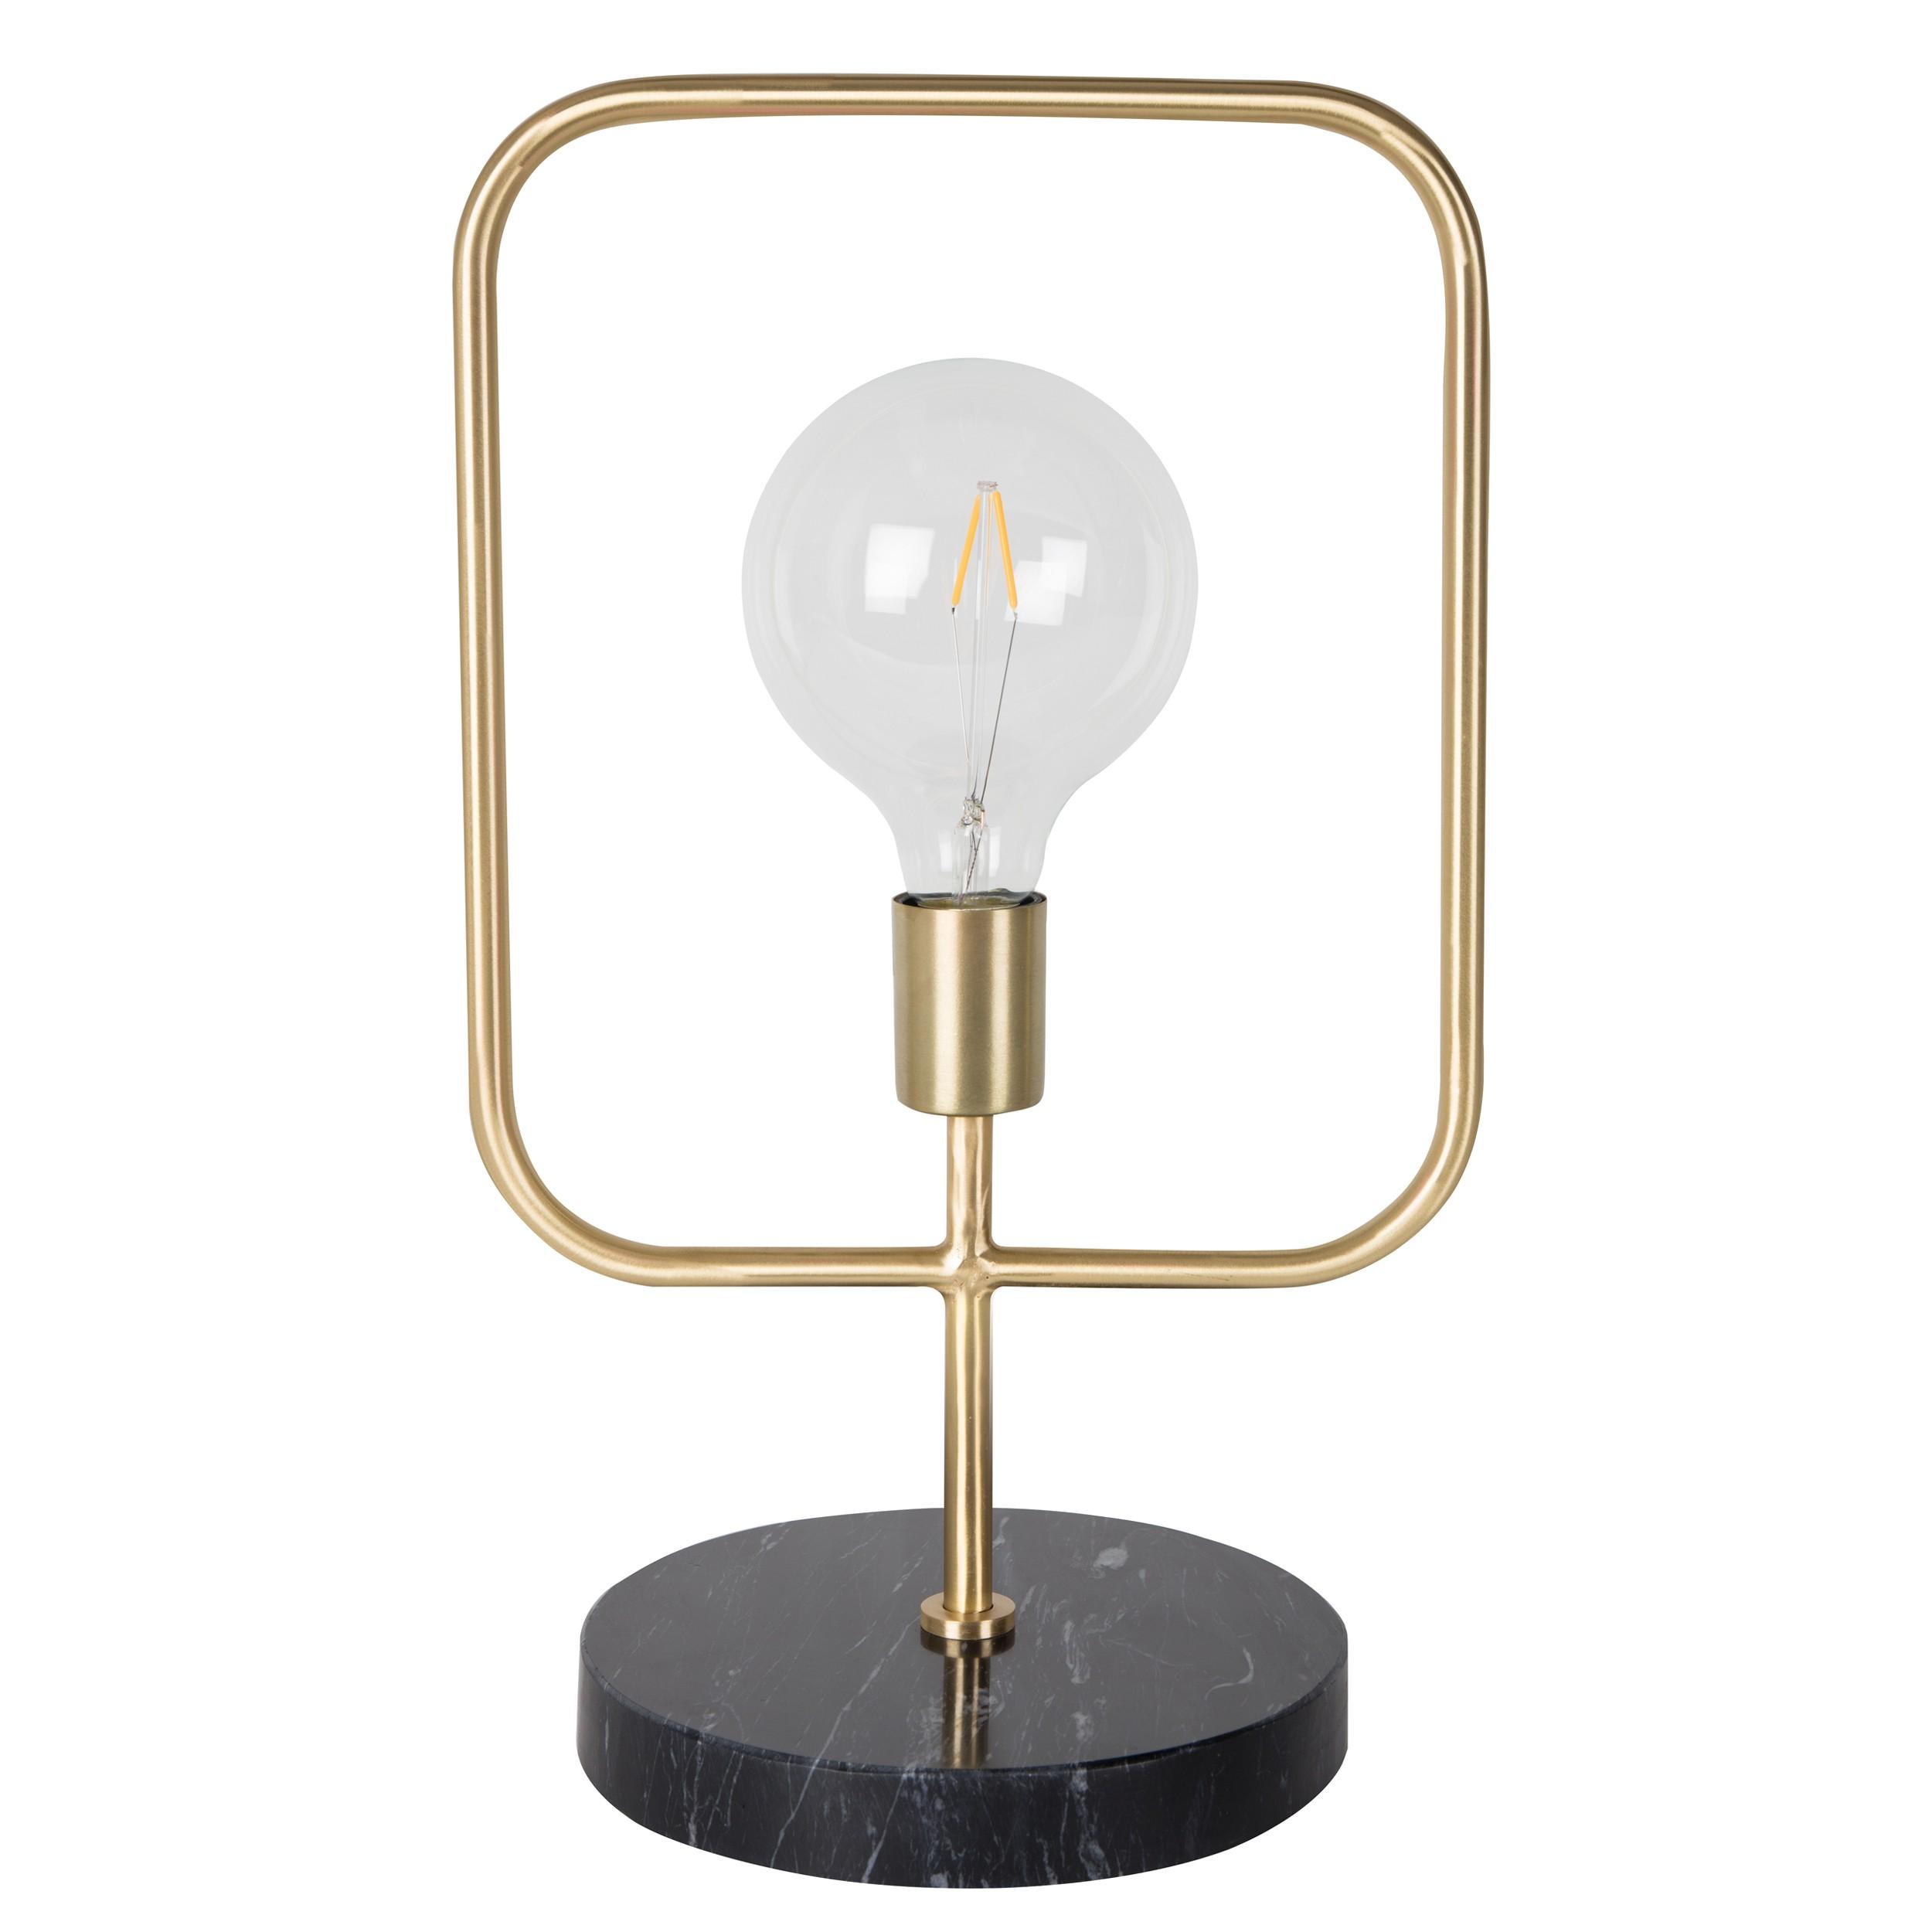 acheter lampe de chevet marbre et or